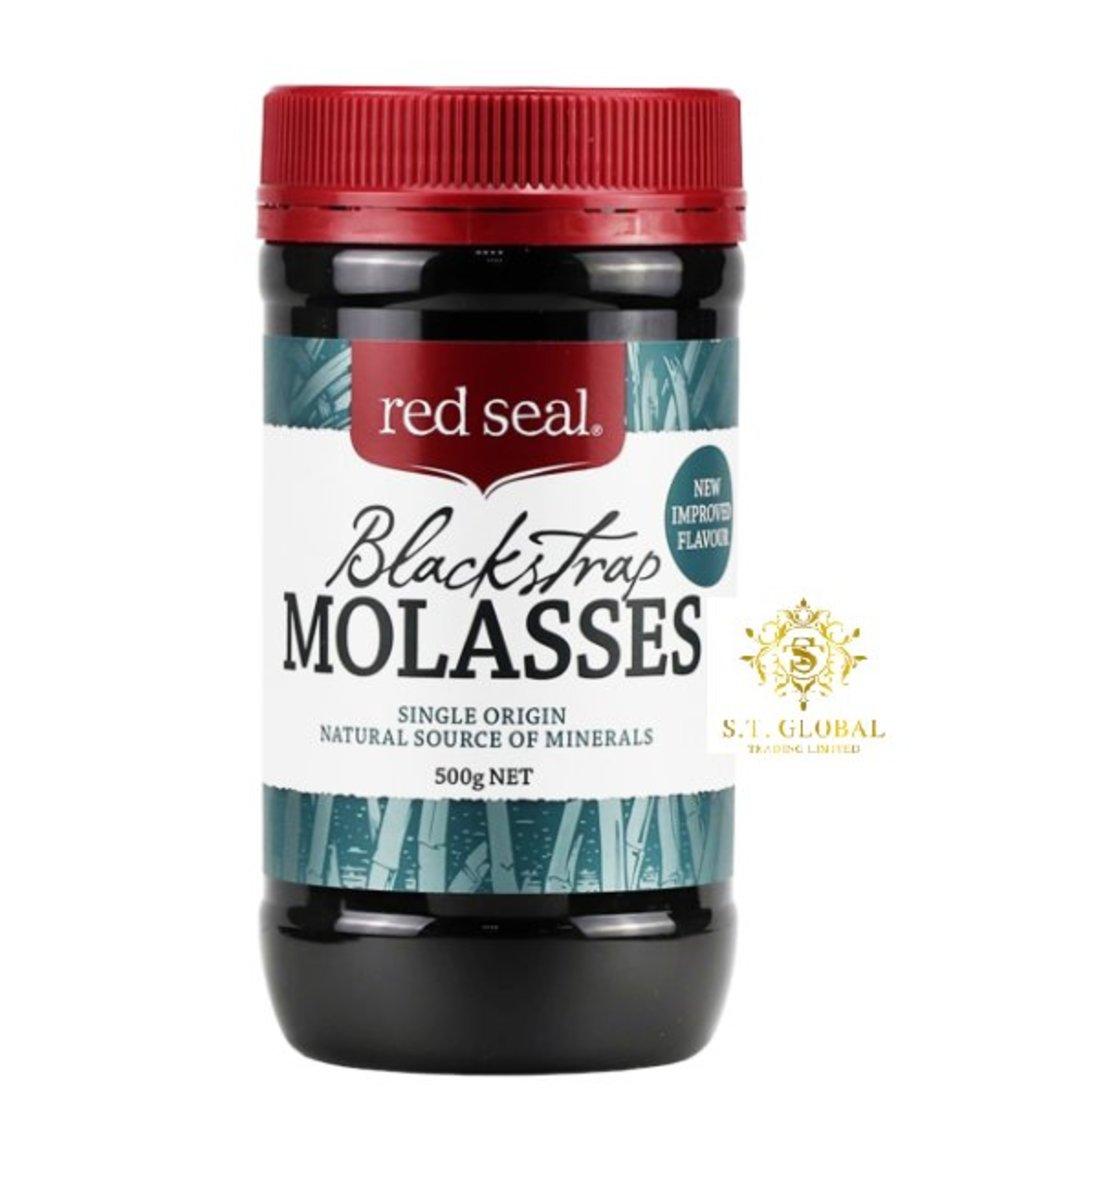 Blackstrap Molasses 500g [Parallel Imports Product]